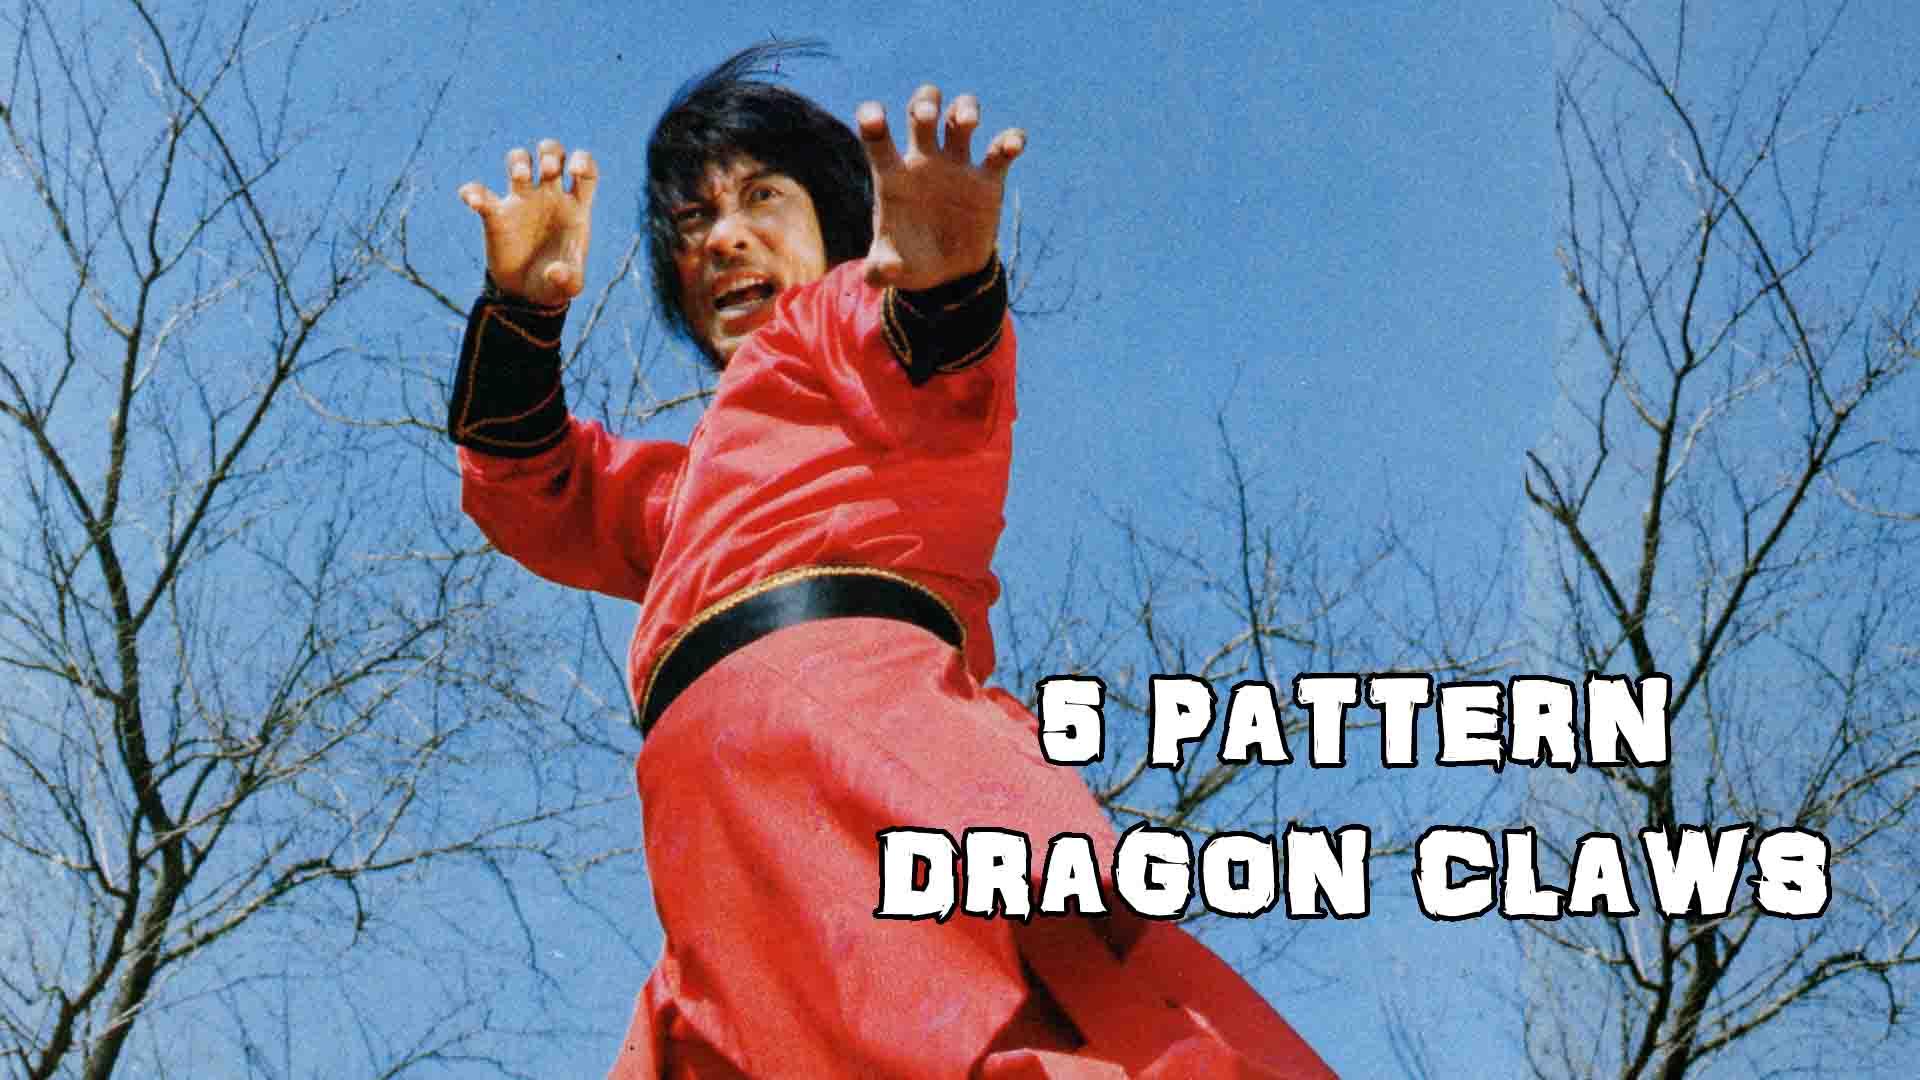 5 Pattern Dragon Claws